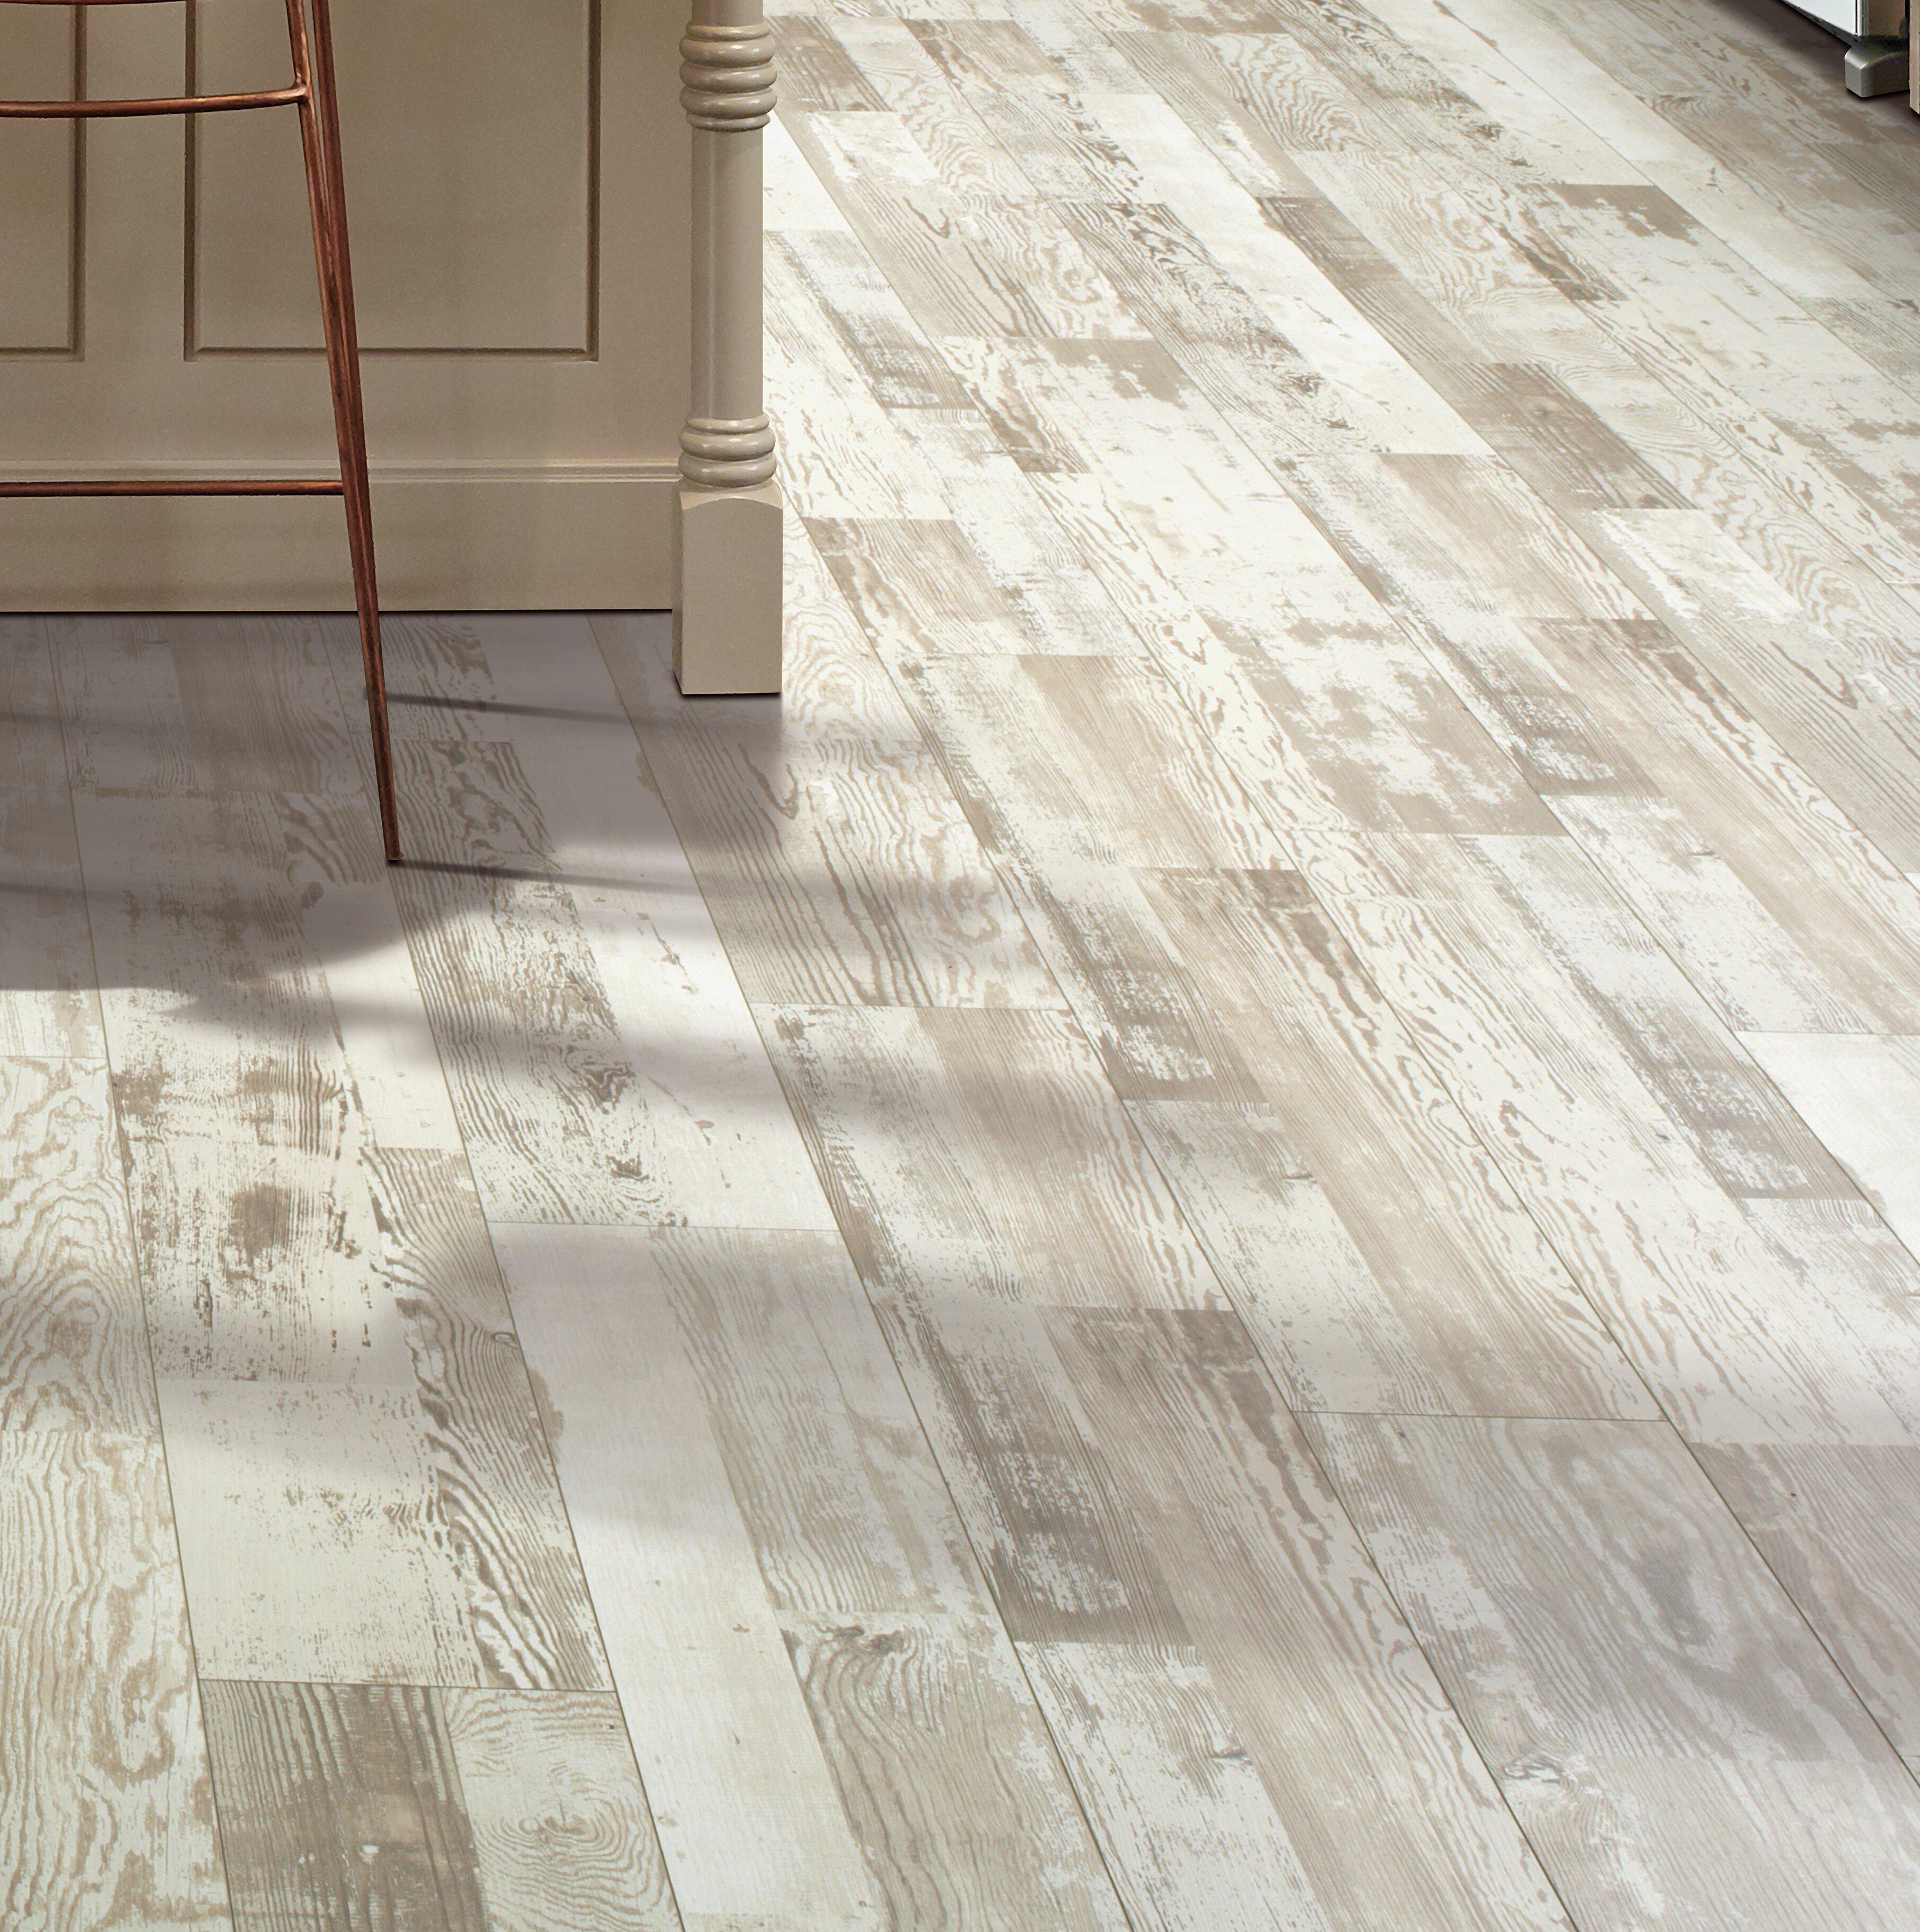 Mohawk Cashe Hills 7 5 X 47 25 87mm Pine Laminate Flooring In White Reviews Wayfair